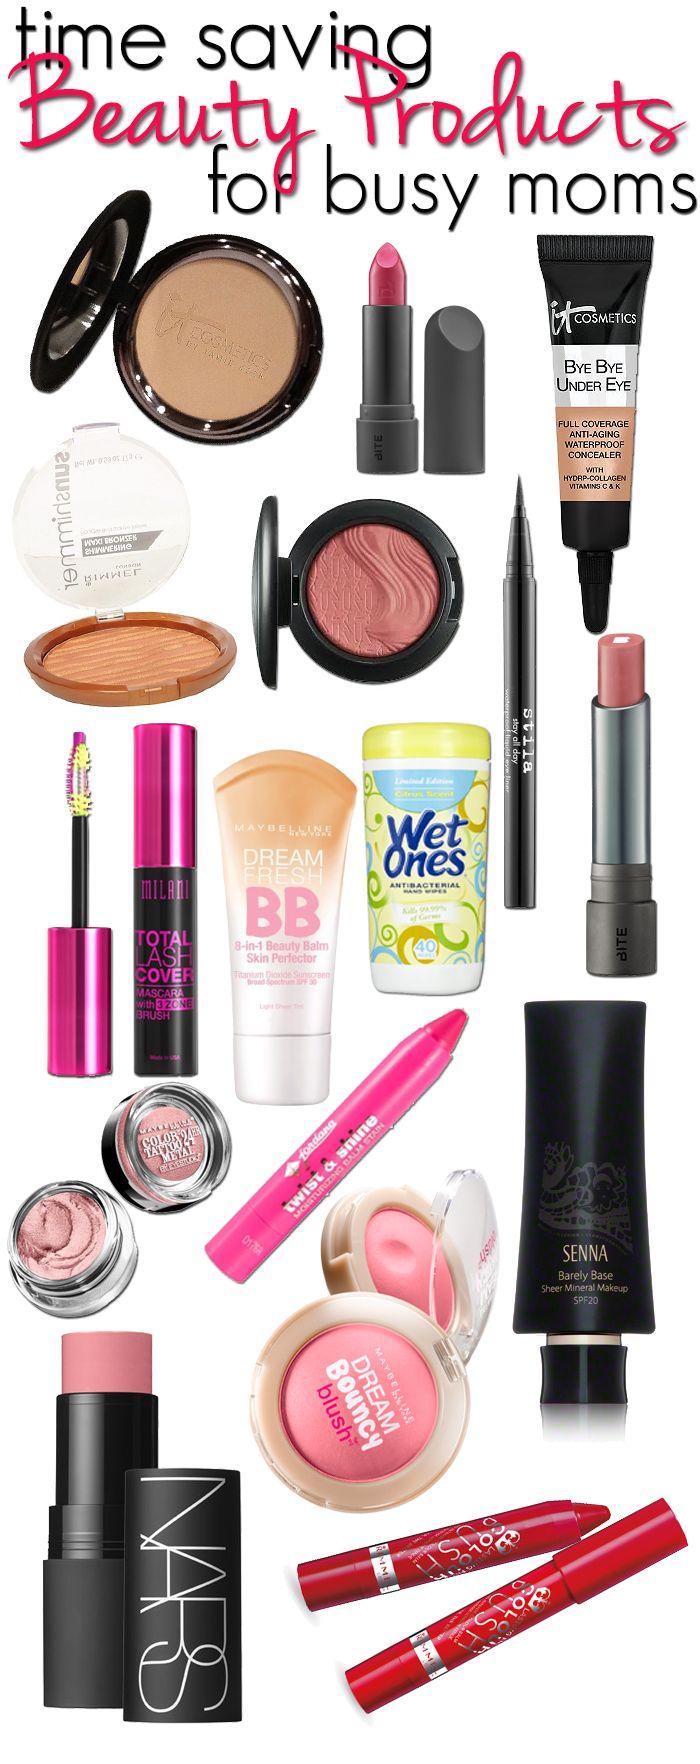 Time Saving Beauty Products  via www.hairsprayandhighheels.com #beauty #makeup #makeuptips